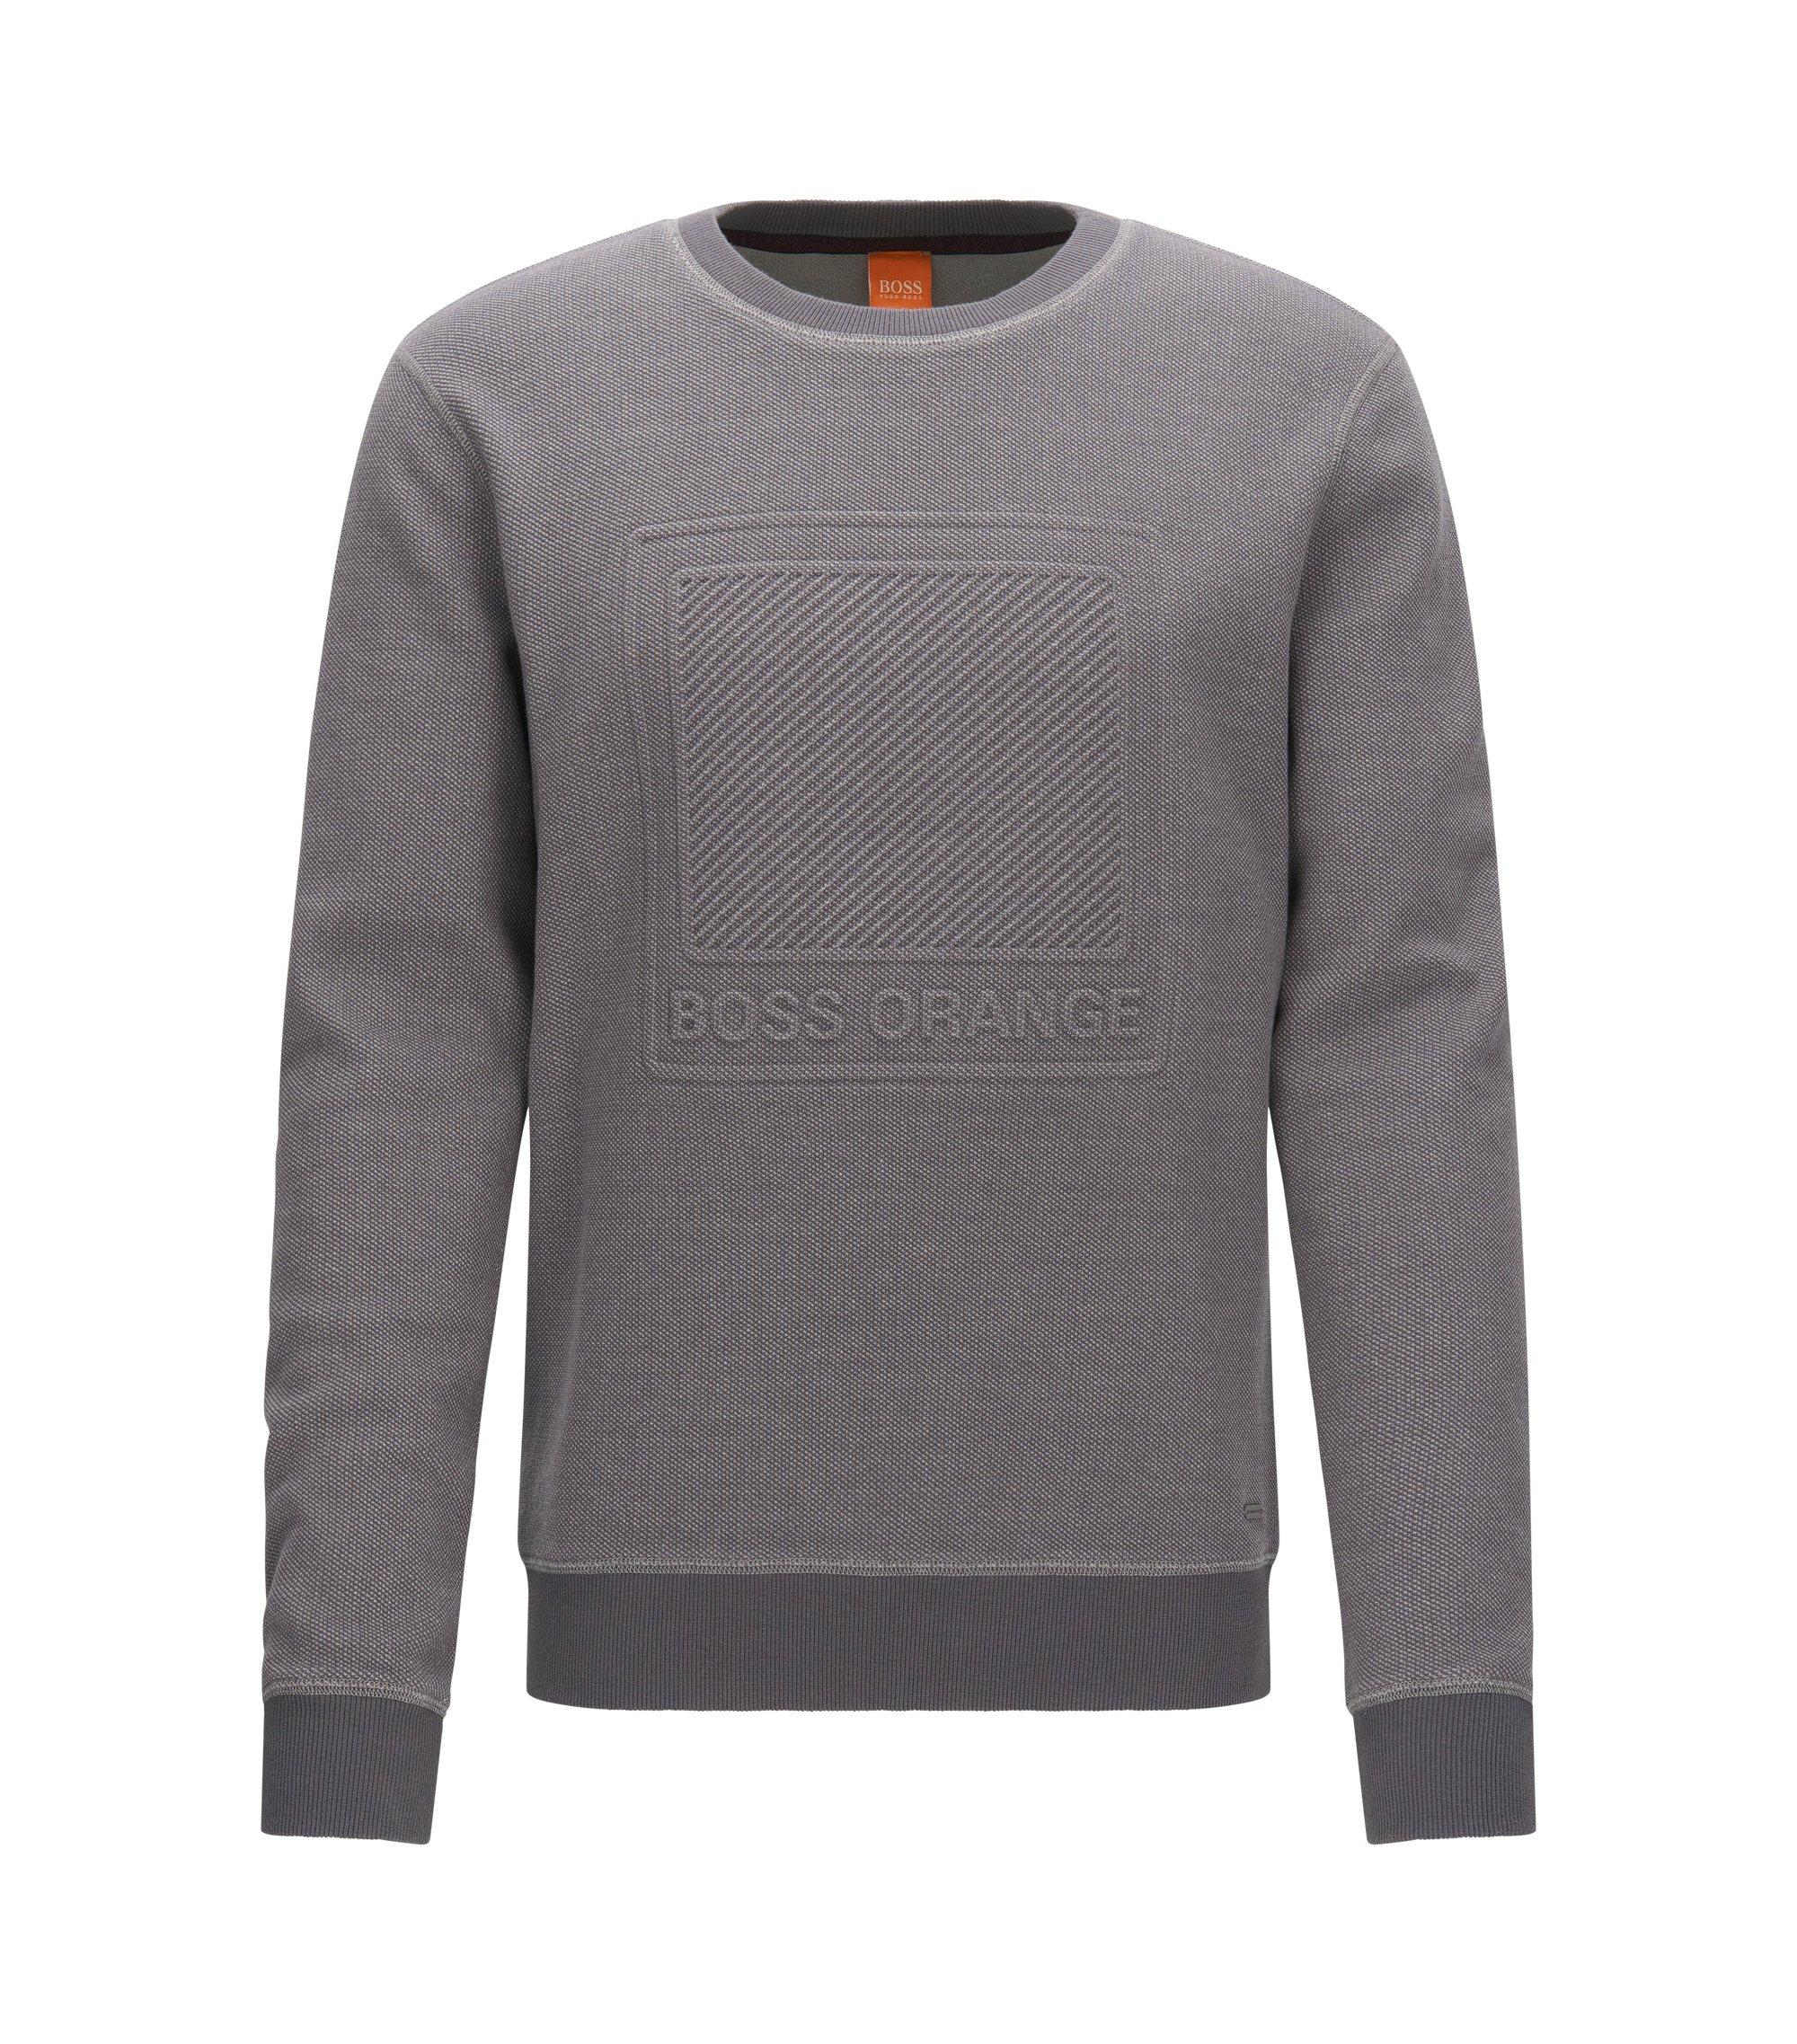 Jersey de algodón con logo en relieve, Gris claro